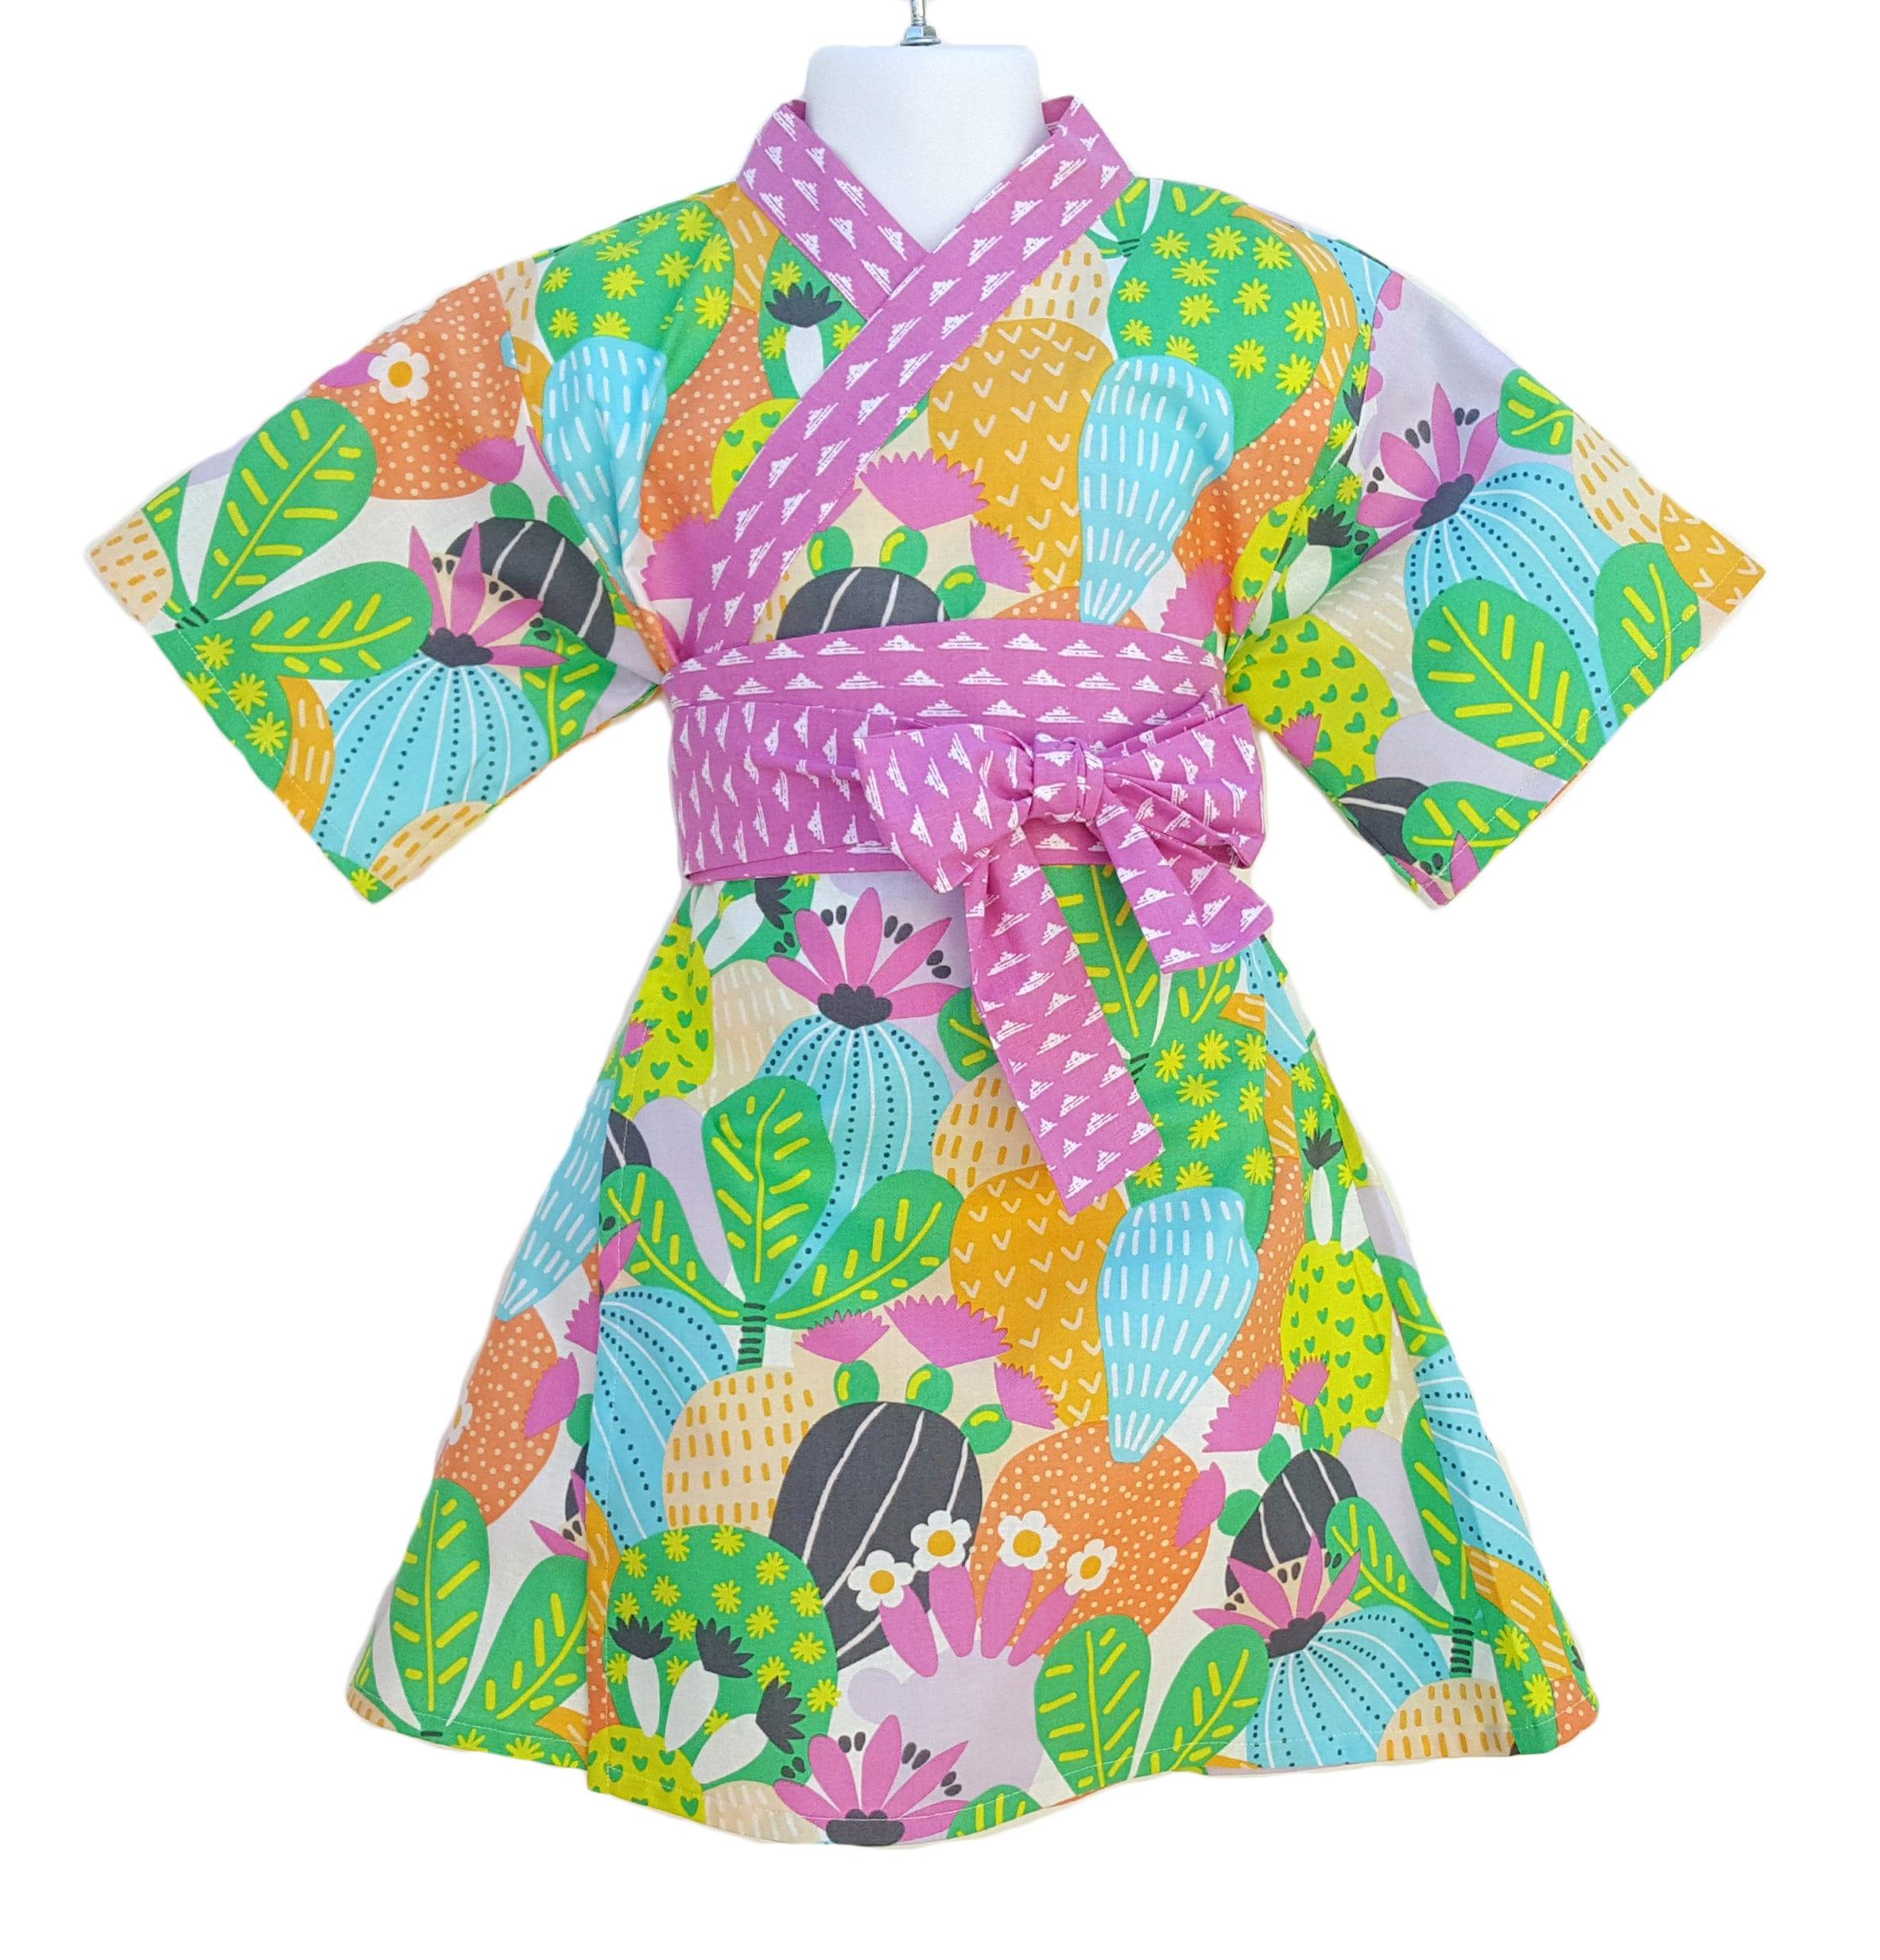 Kimono Dress CACTUS BLOOM Yukata Modern Kimono Girls Baby